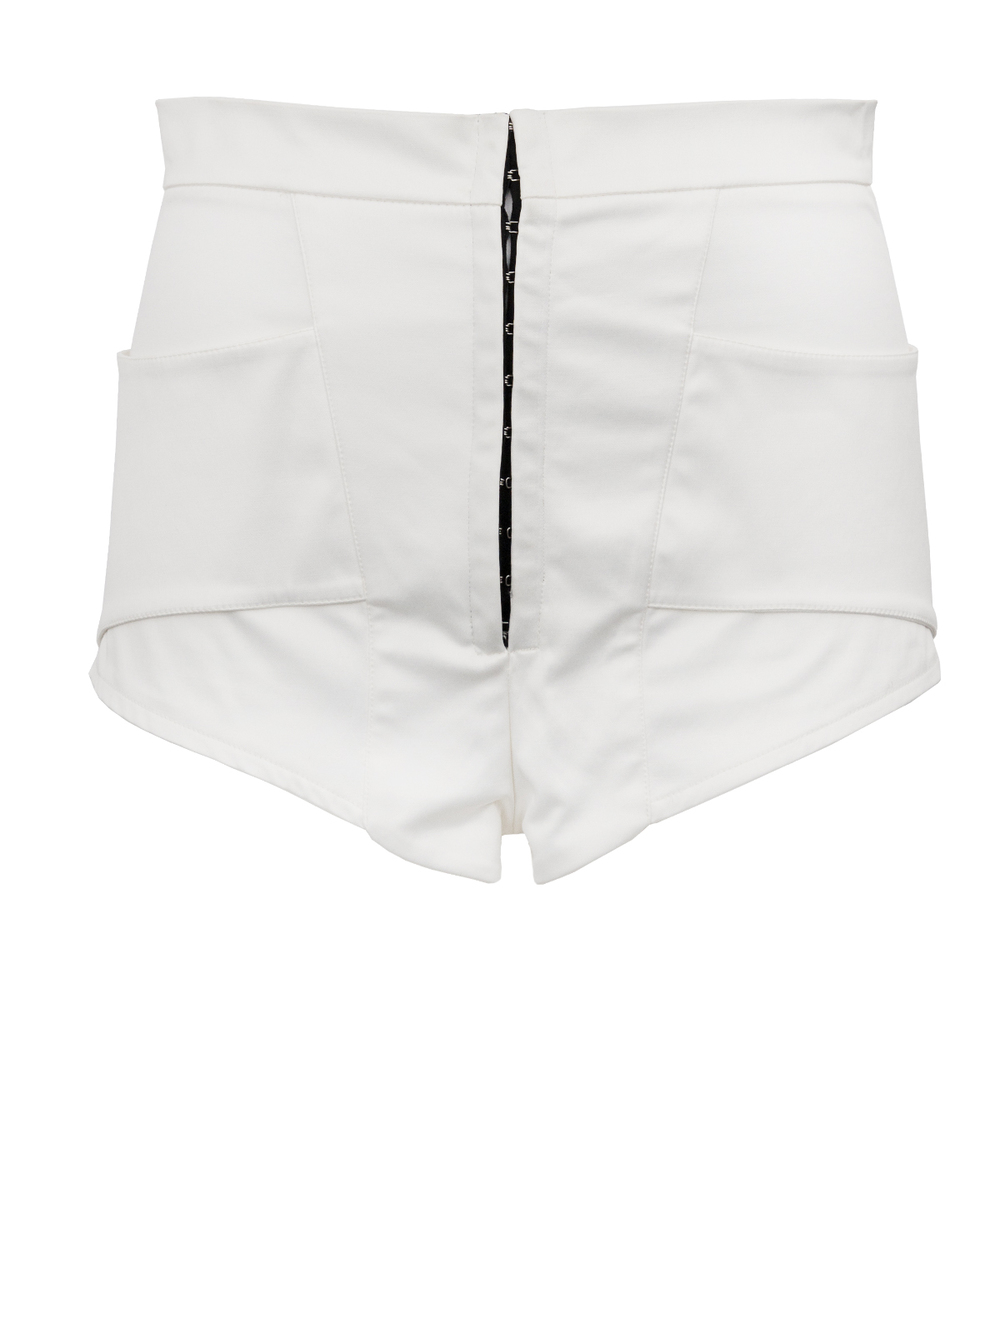 Pulp Shorts - front.jpg